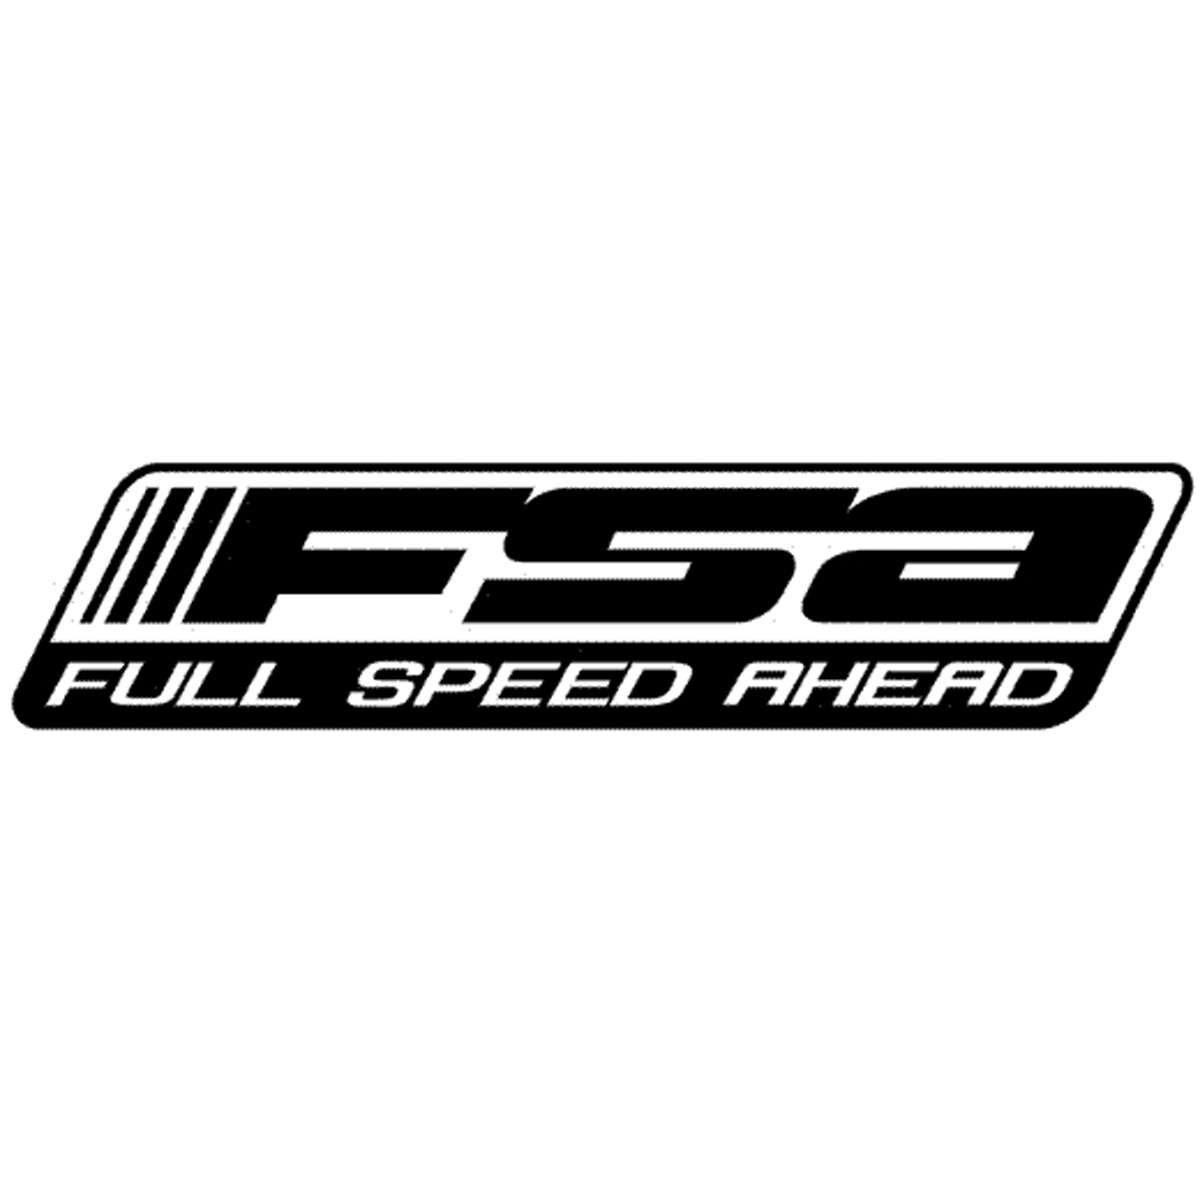 FSA Powerbox合金Road ABS自転車Chainring – 110 x 50t ( 4h ) – 371 – 0023005012 B0779QJBPX